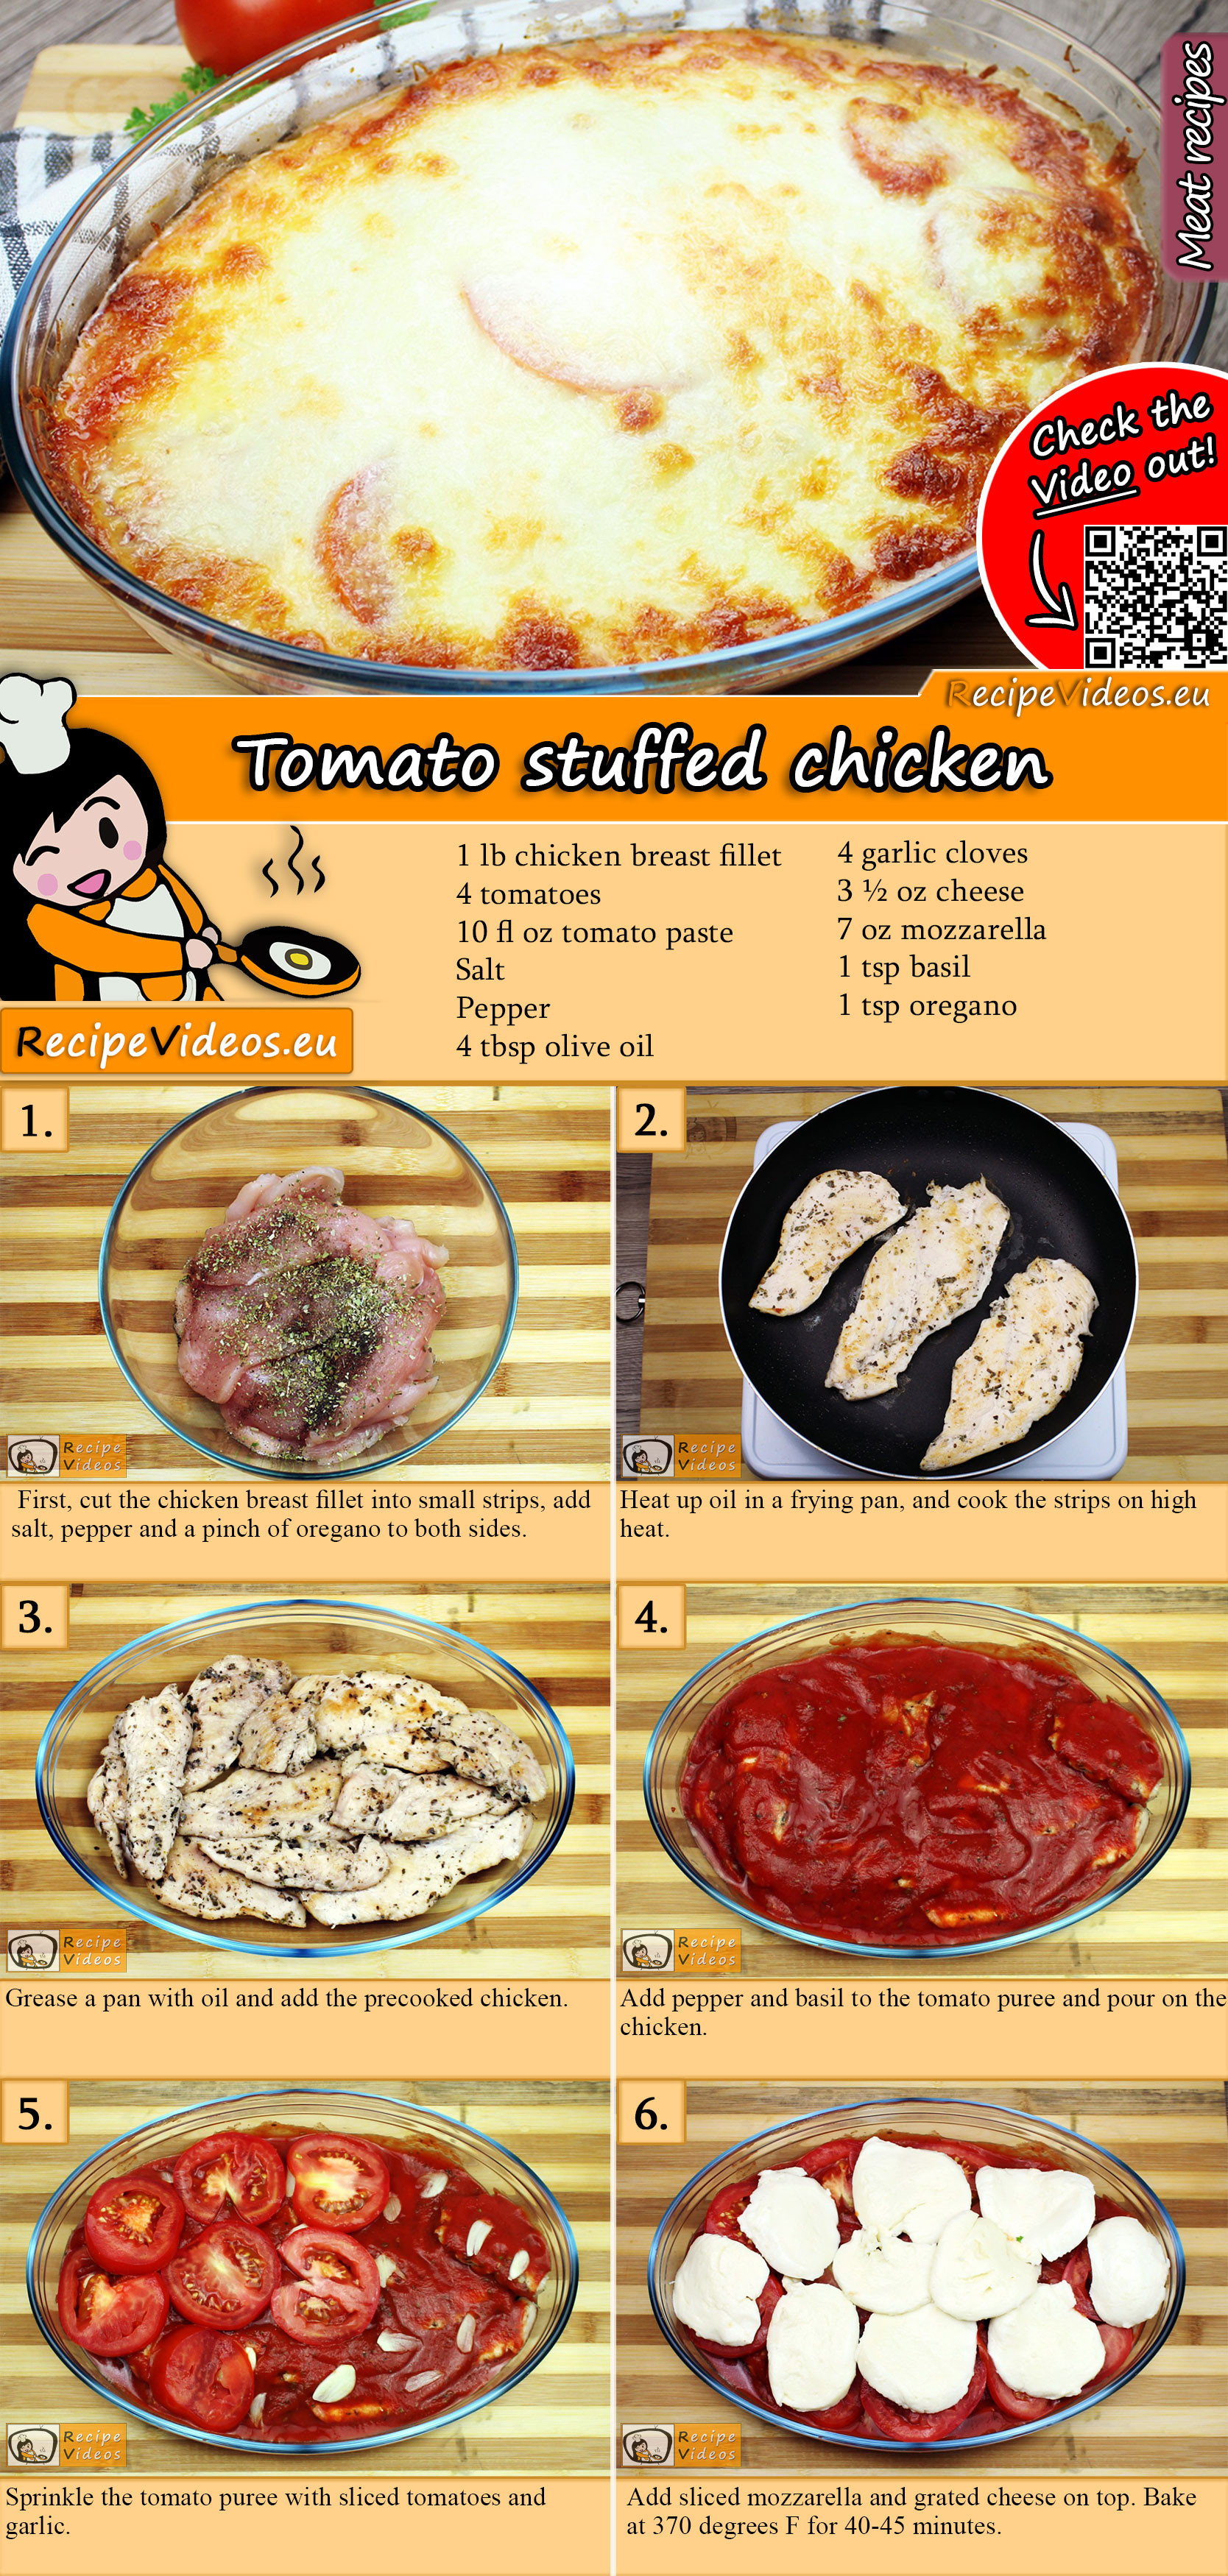 Tomato stuffed chicken recipe with video